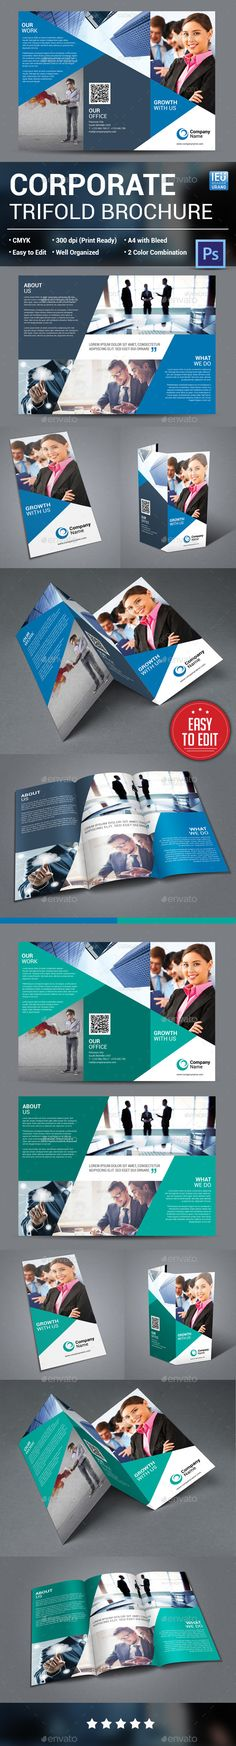 Corporate Trifold Brochure Template PSD #design Download: http://graphicriver.net/item/corporate-trifold-brochure/13948676?ref=ksioks